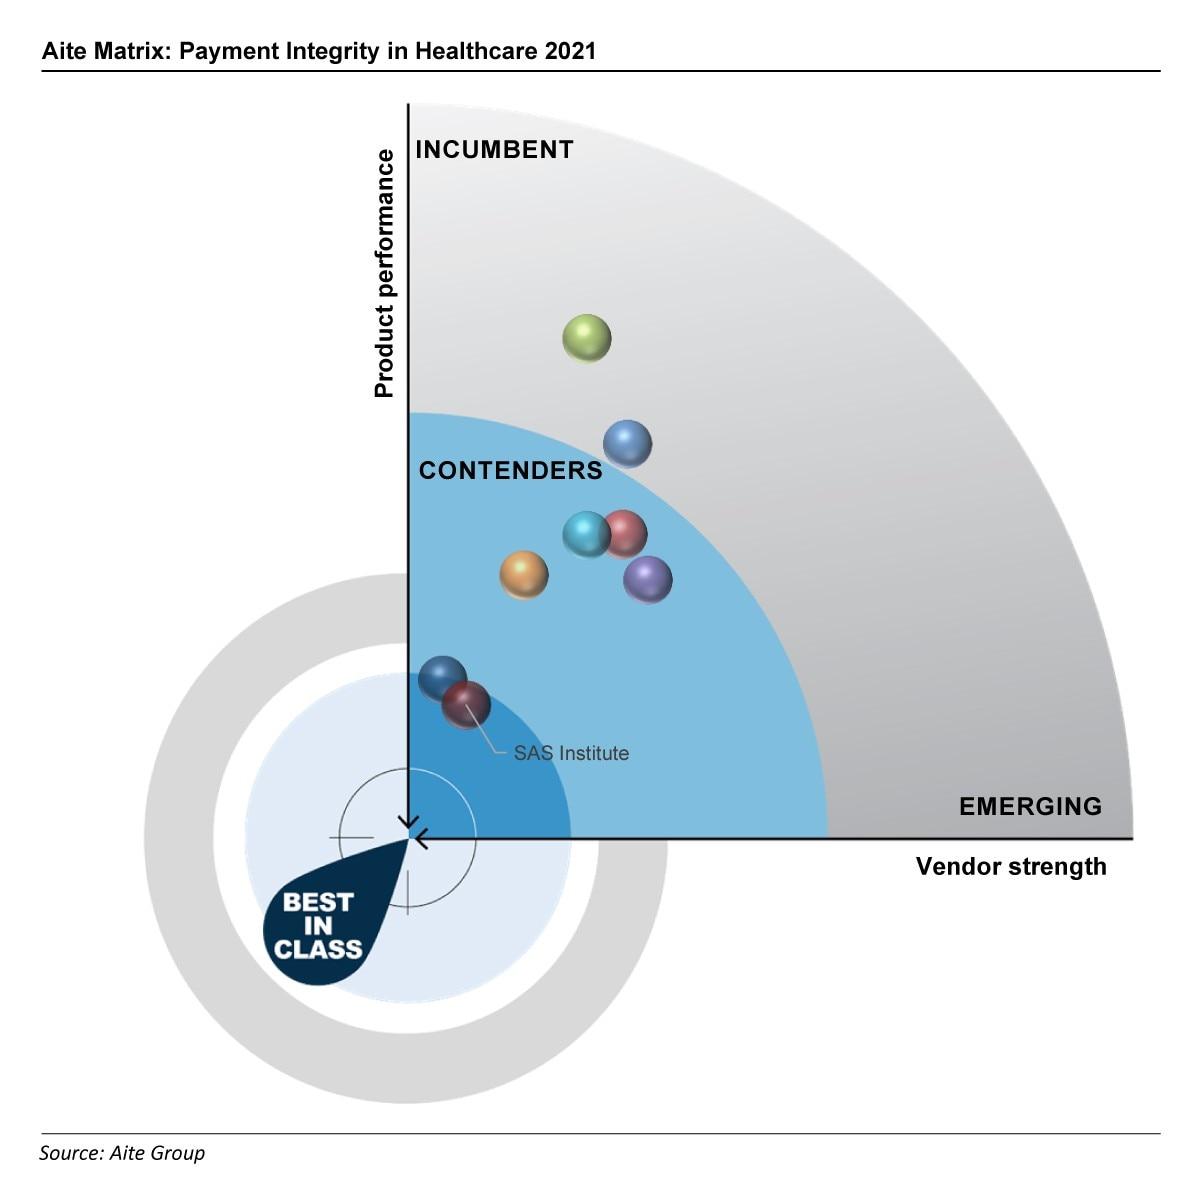 Aite matrix healthcare payment integrity graphic